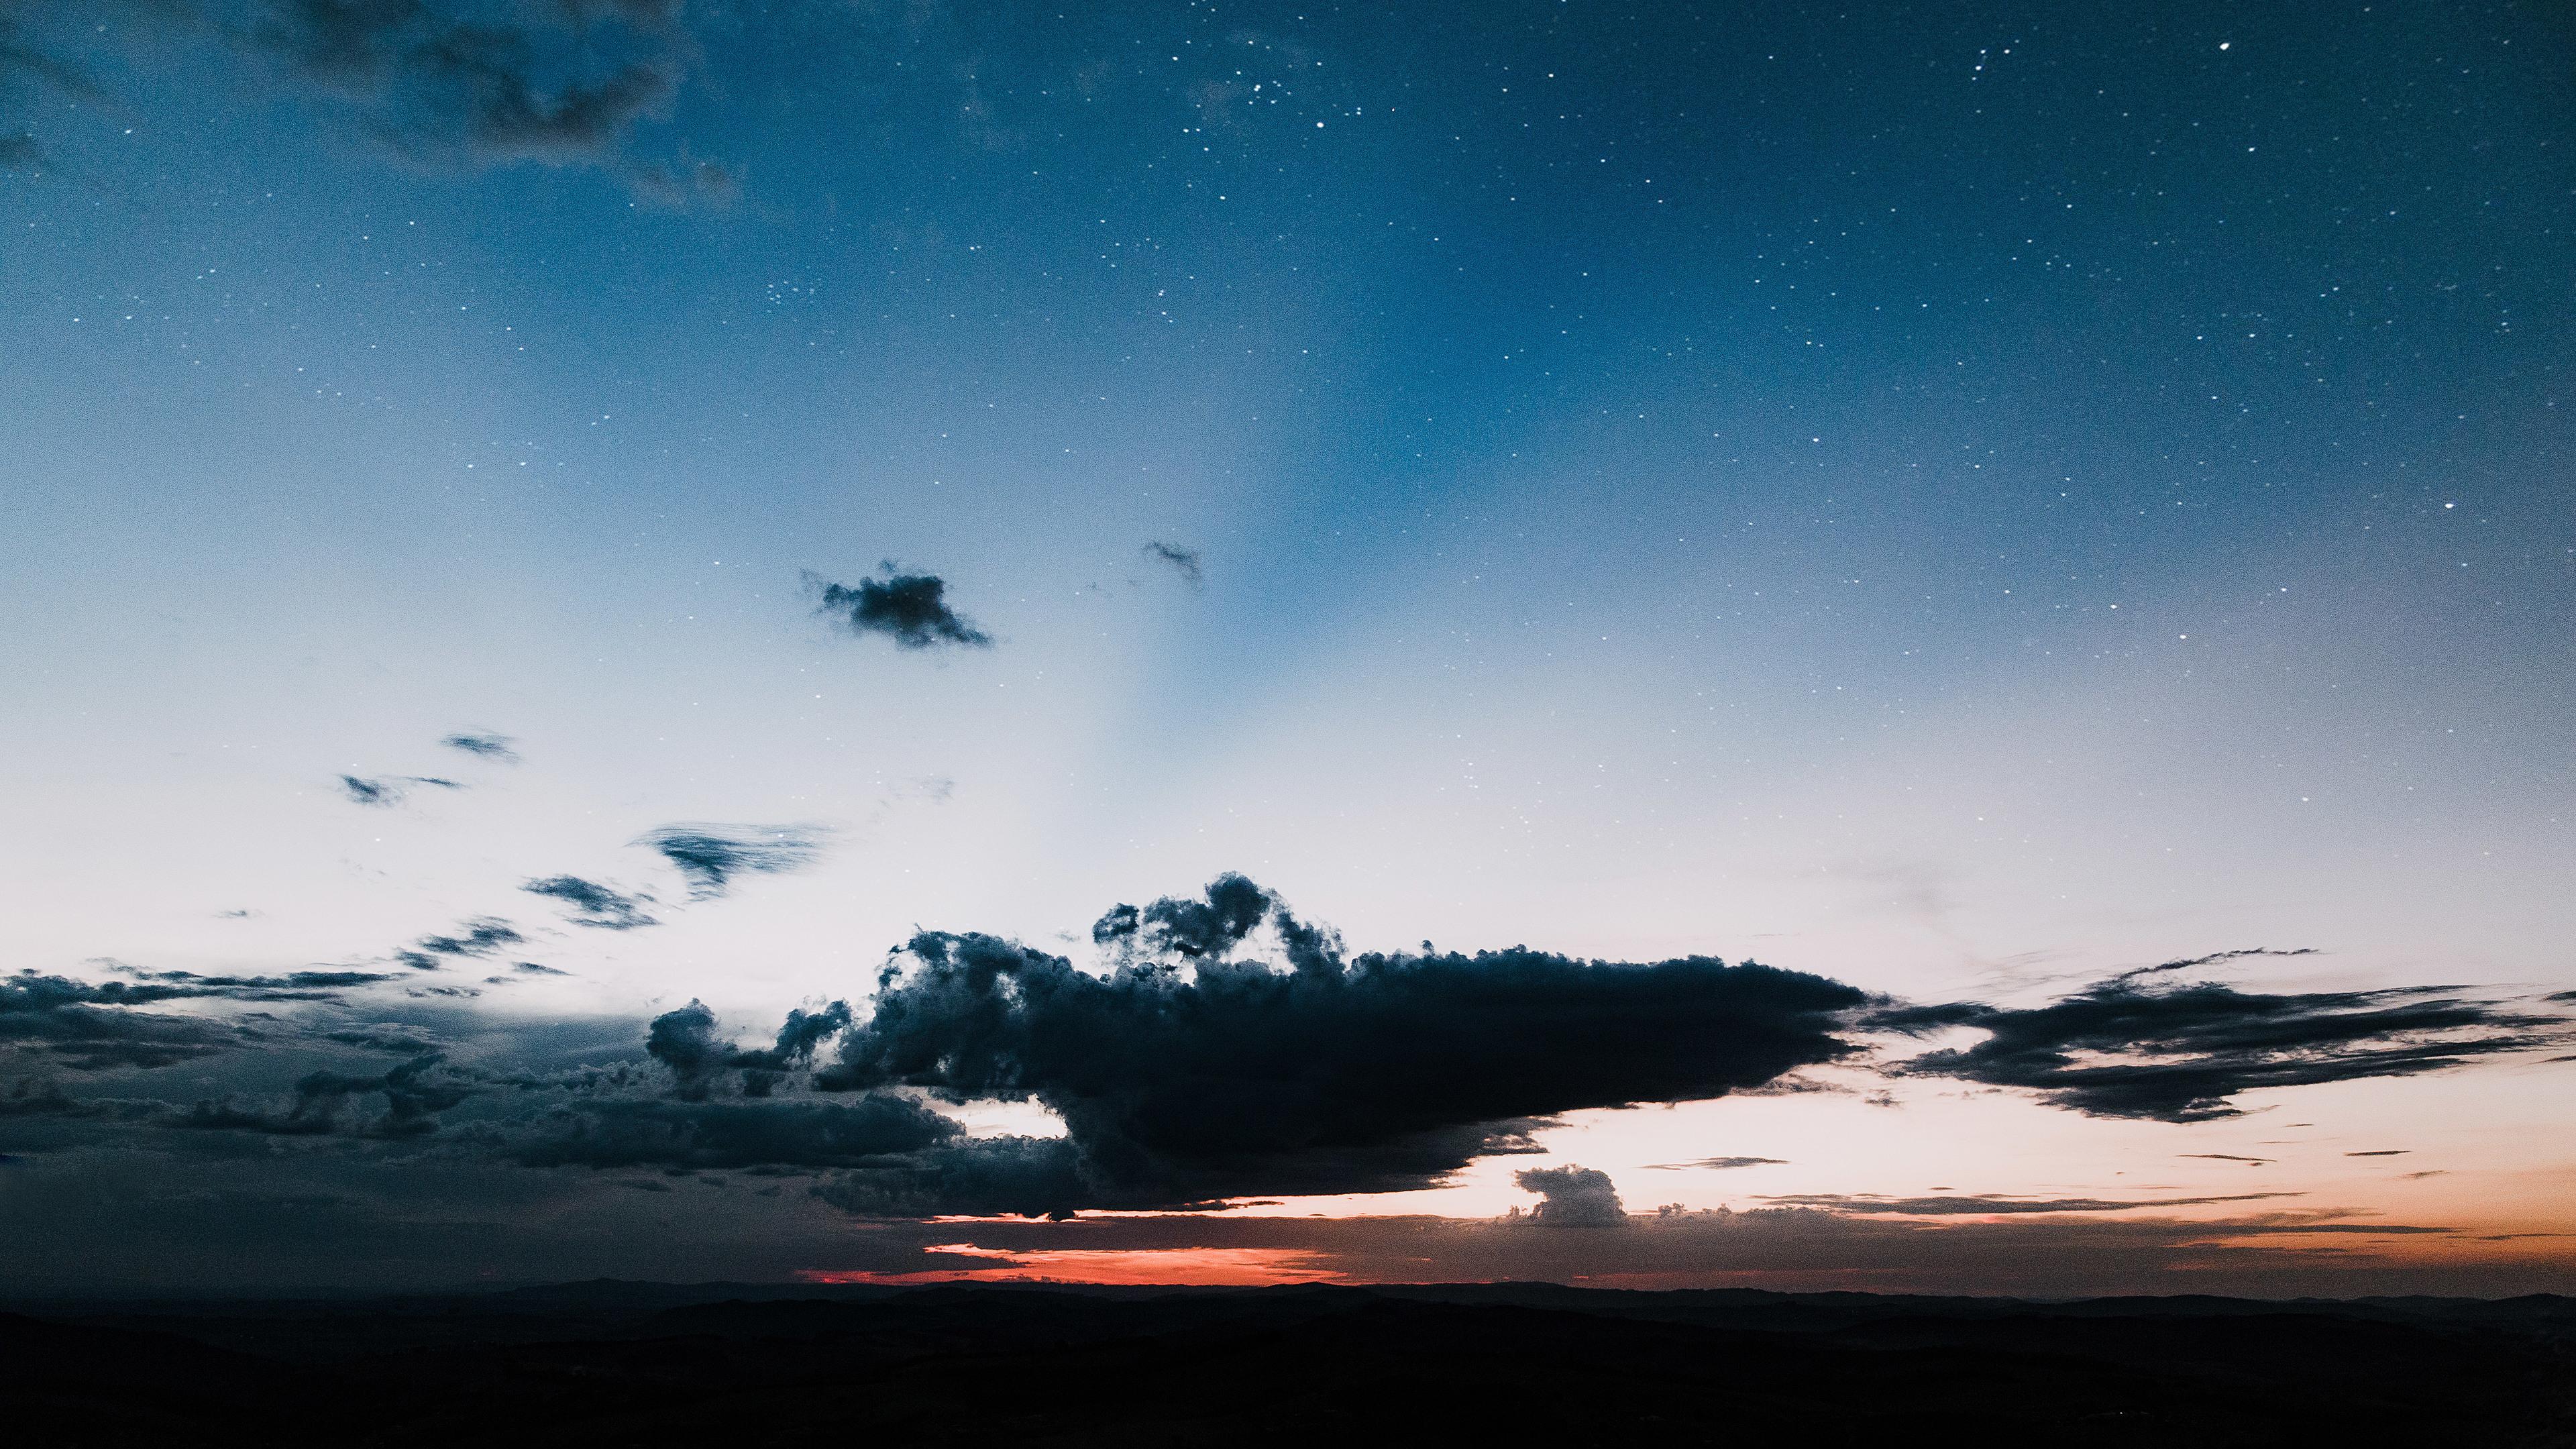 beautiful clouds scenery sunrise sunset view 4k 1540135888 - Beautiful Clouds Scenery Sunrise Sunset View 4k - sunset wallpapers, sunrise wallpapers, scenery wallpapers, nature wallpapers, hd-wallpapers, clouds wallpapers, 4k-wallpapers